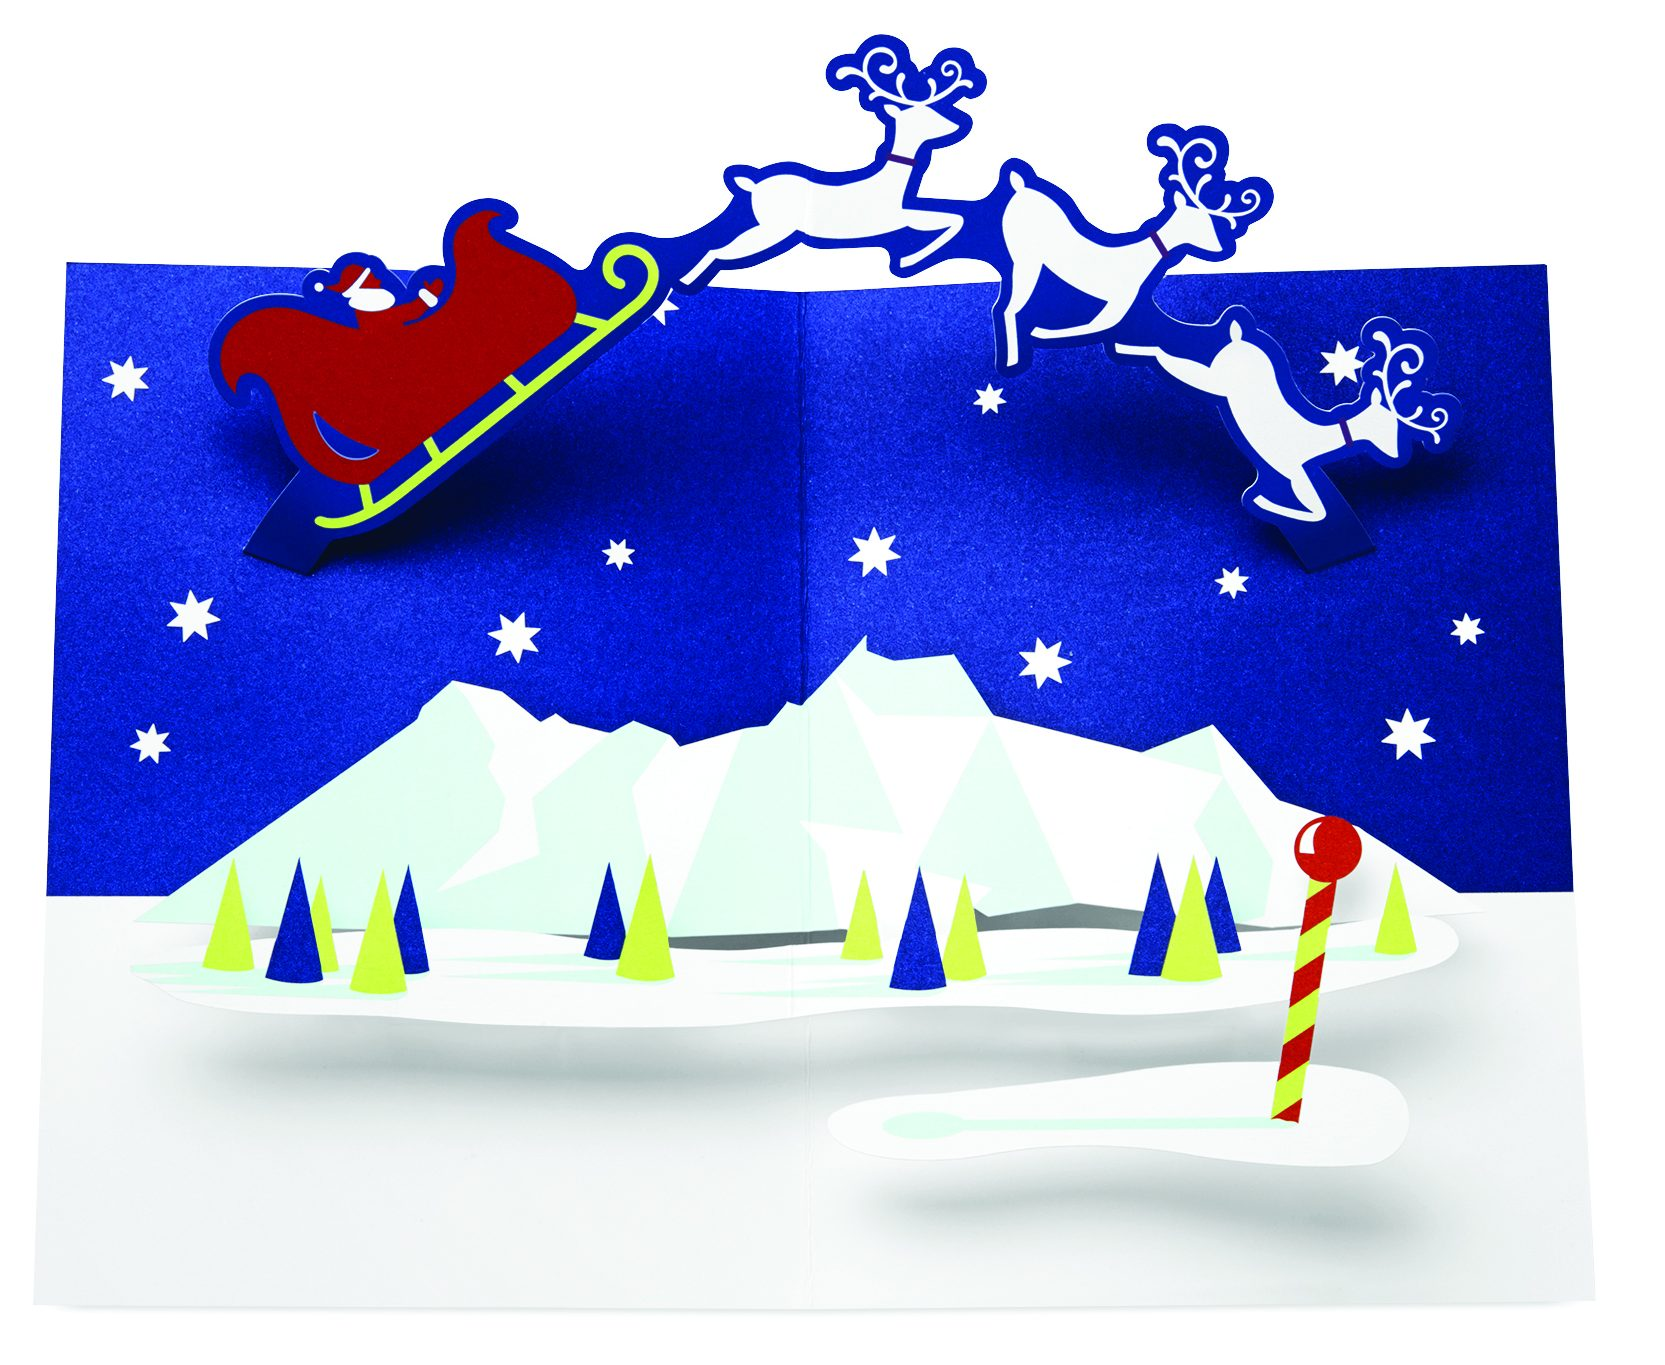 moma-christmas-card-e1508950239524